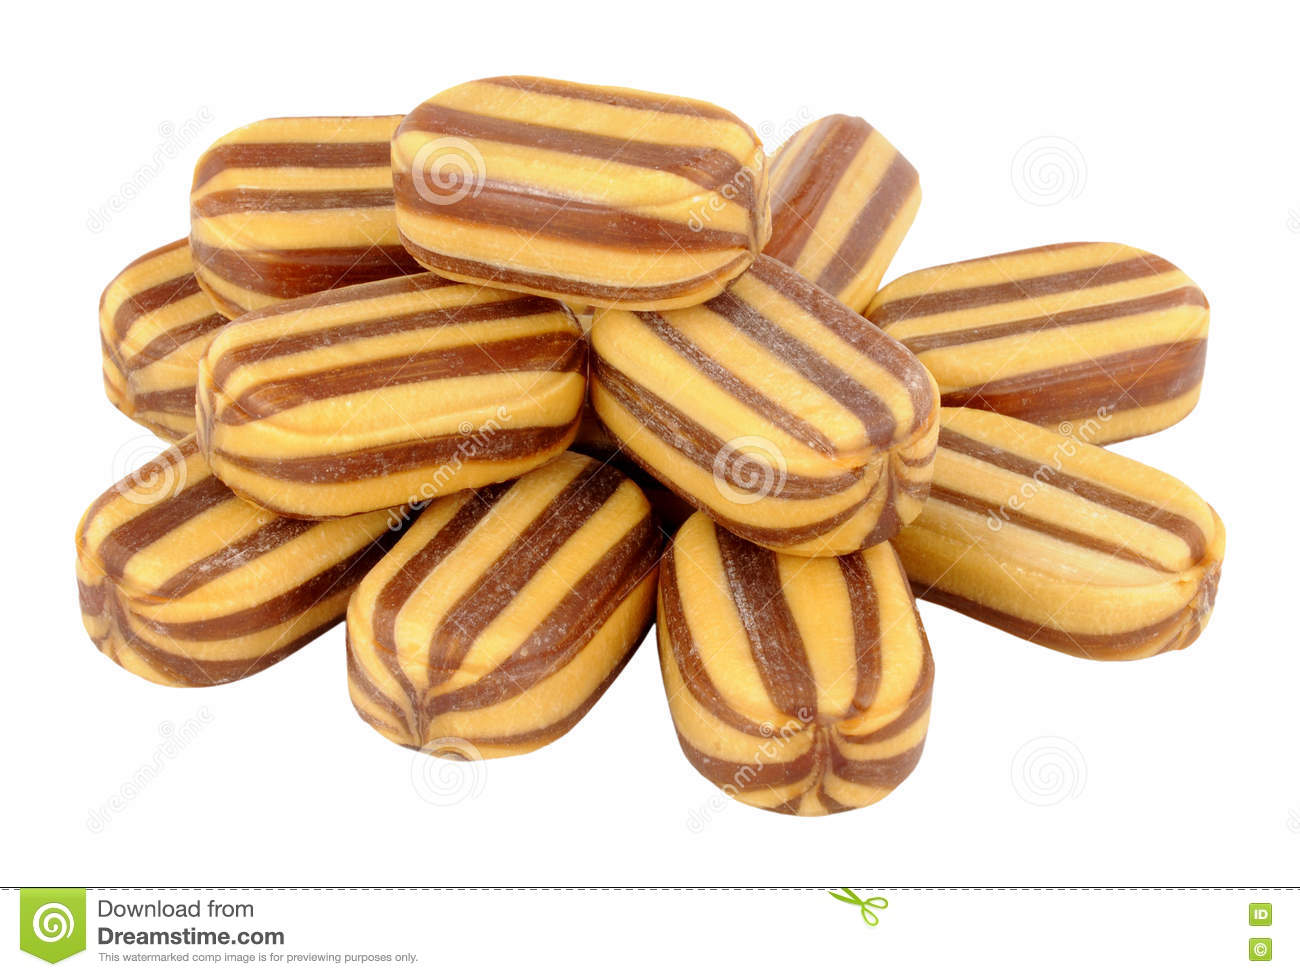 mint-humbug-sweets-group-striped-humbugs-isolated-white-background-71278219.jpg